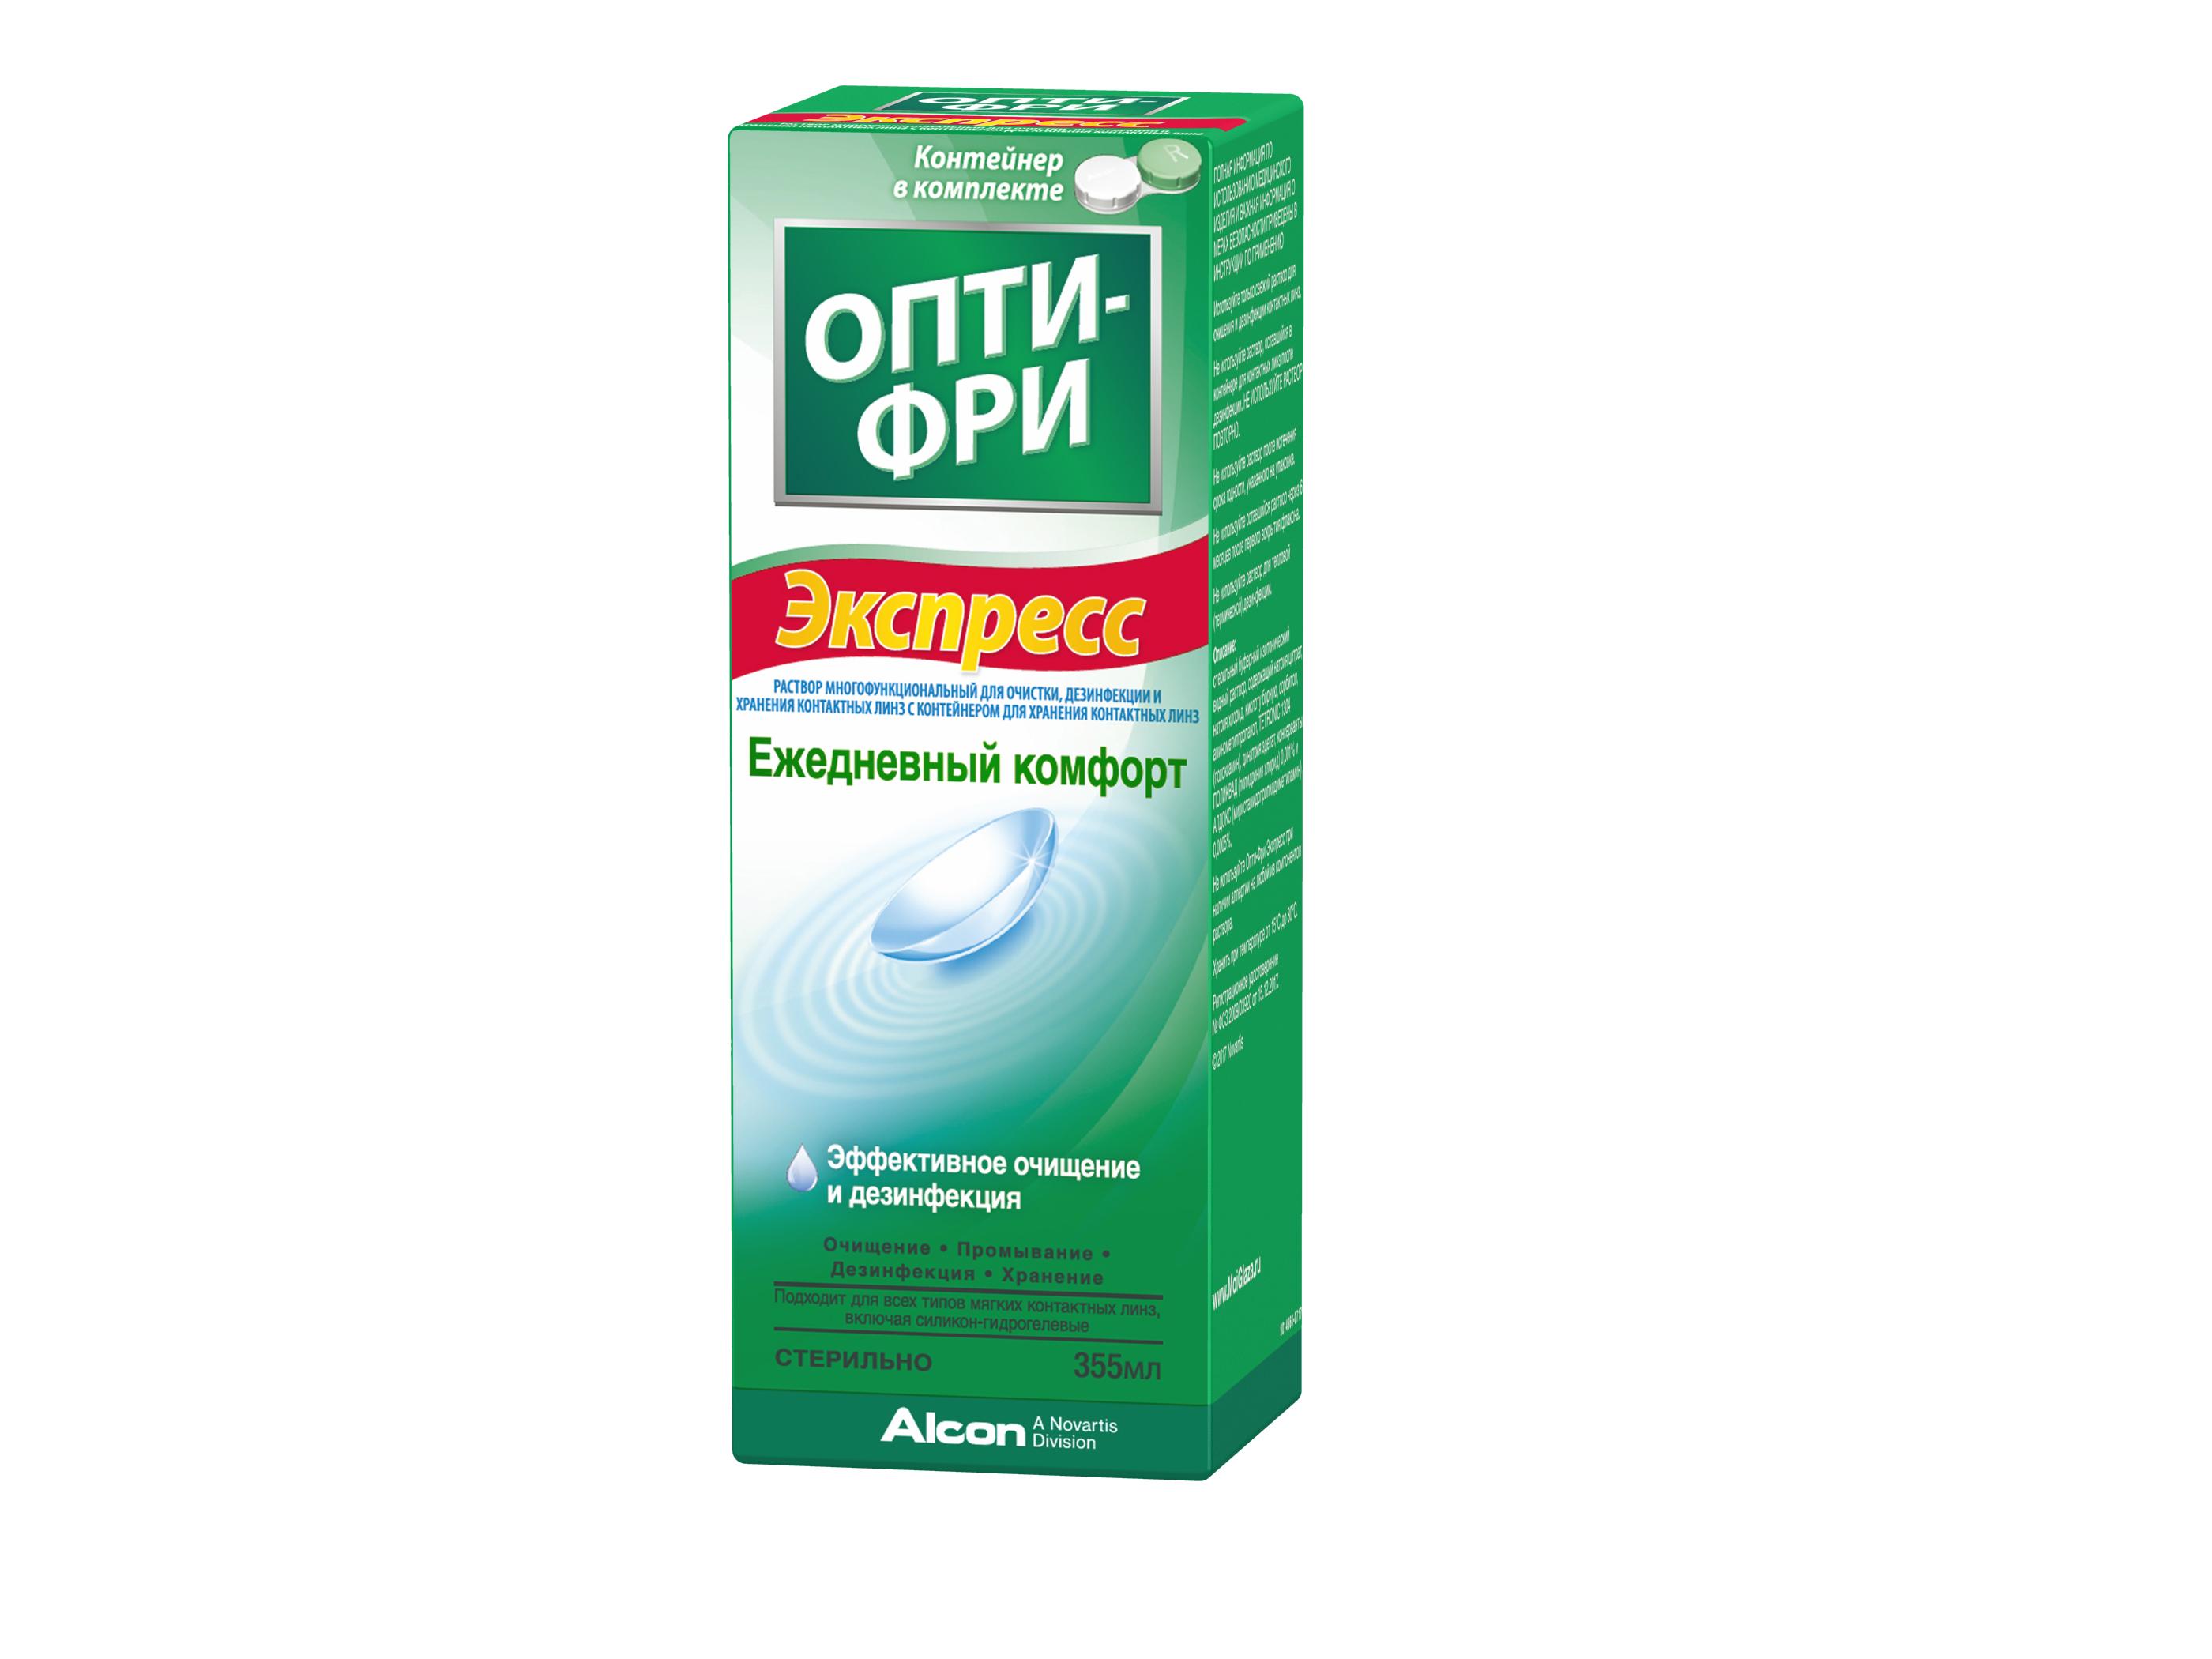 Раствор Опти-Фри  Express (355 ml + контейнер) за 450.00 руб.